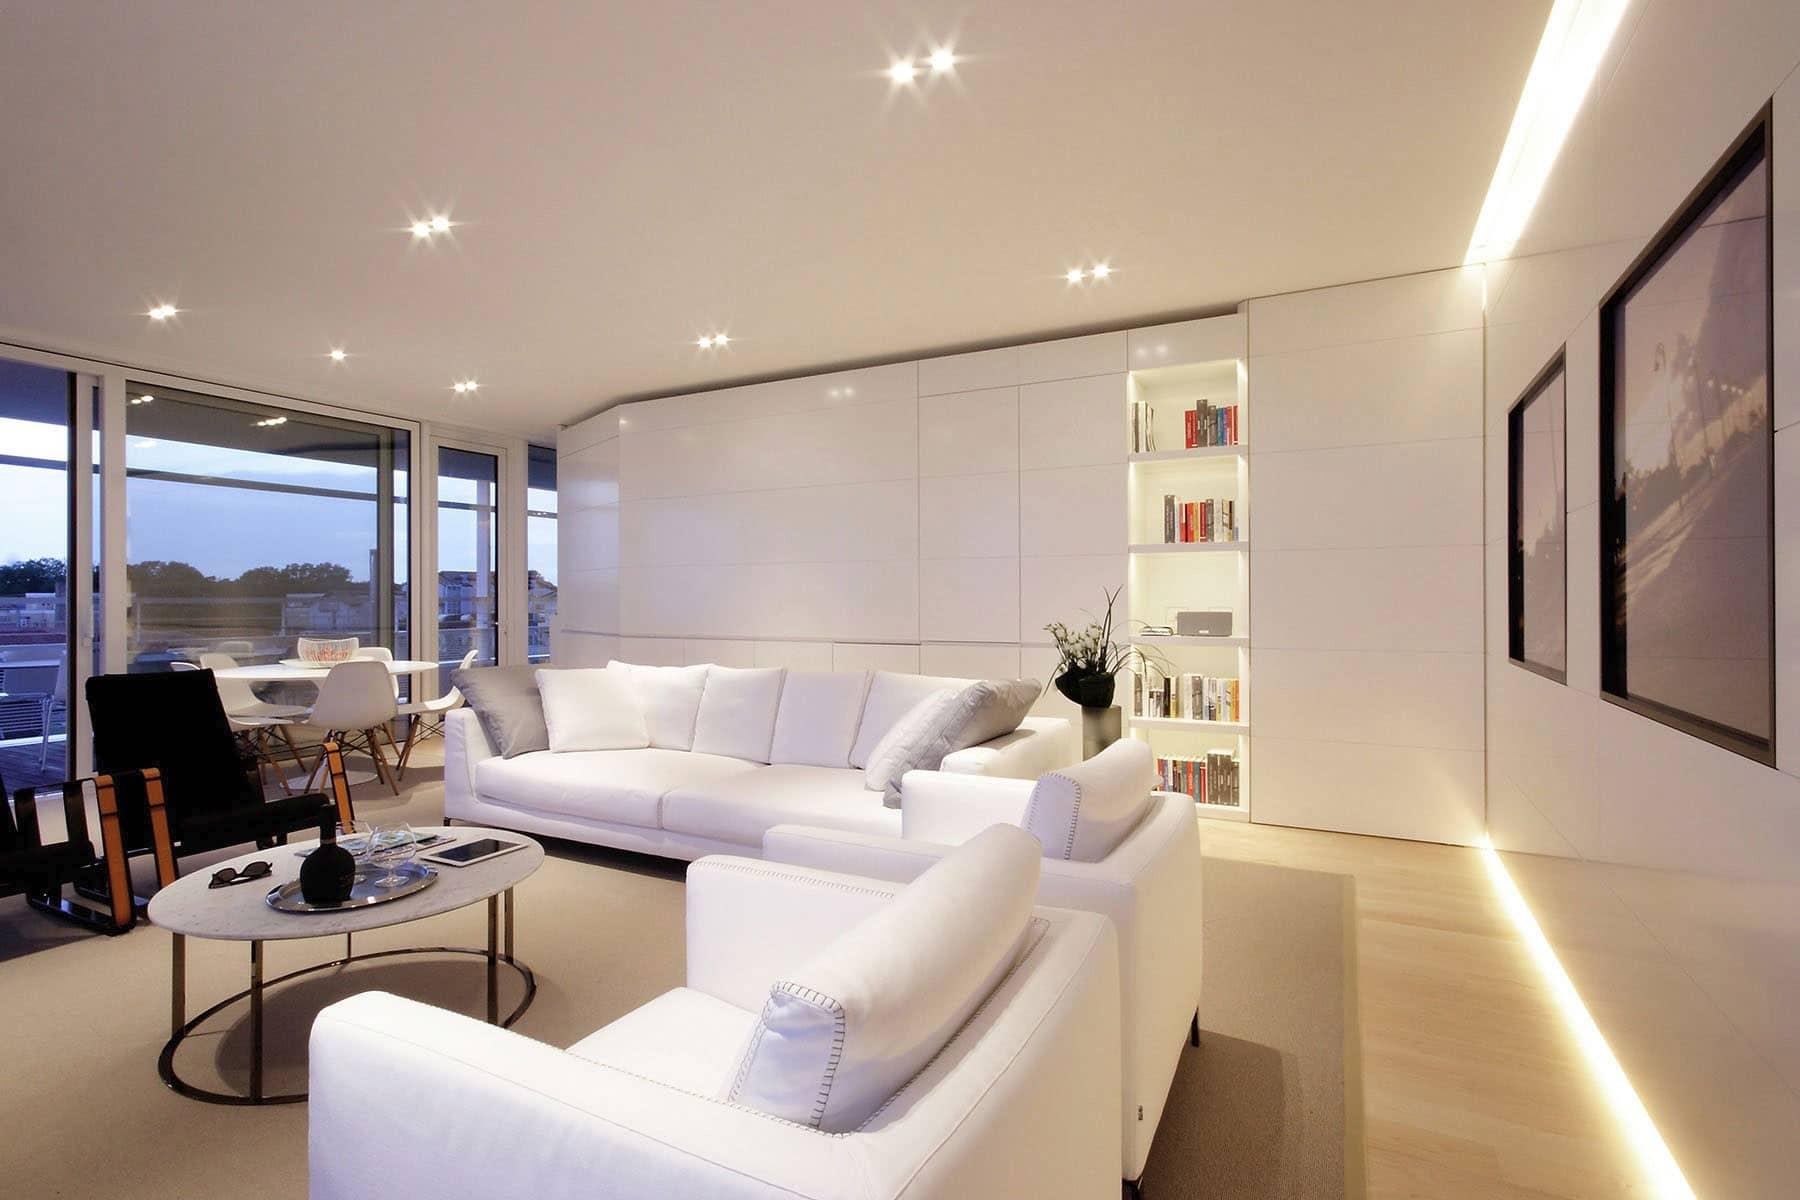 Plano departamento peque o dos dormitorios for Disenos de departamentos pequenos modernos